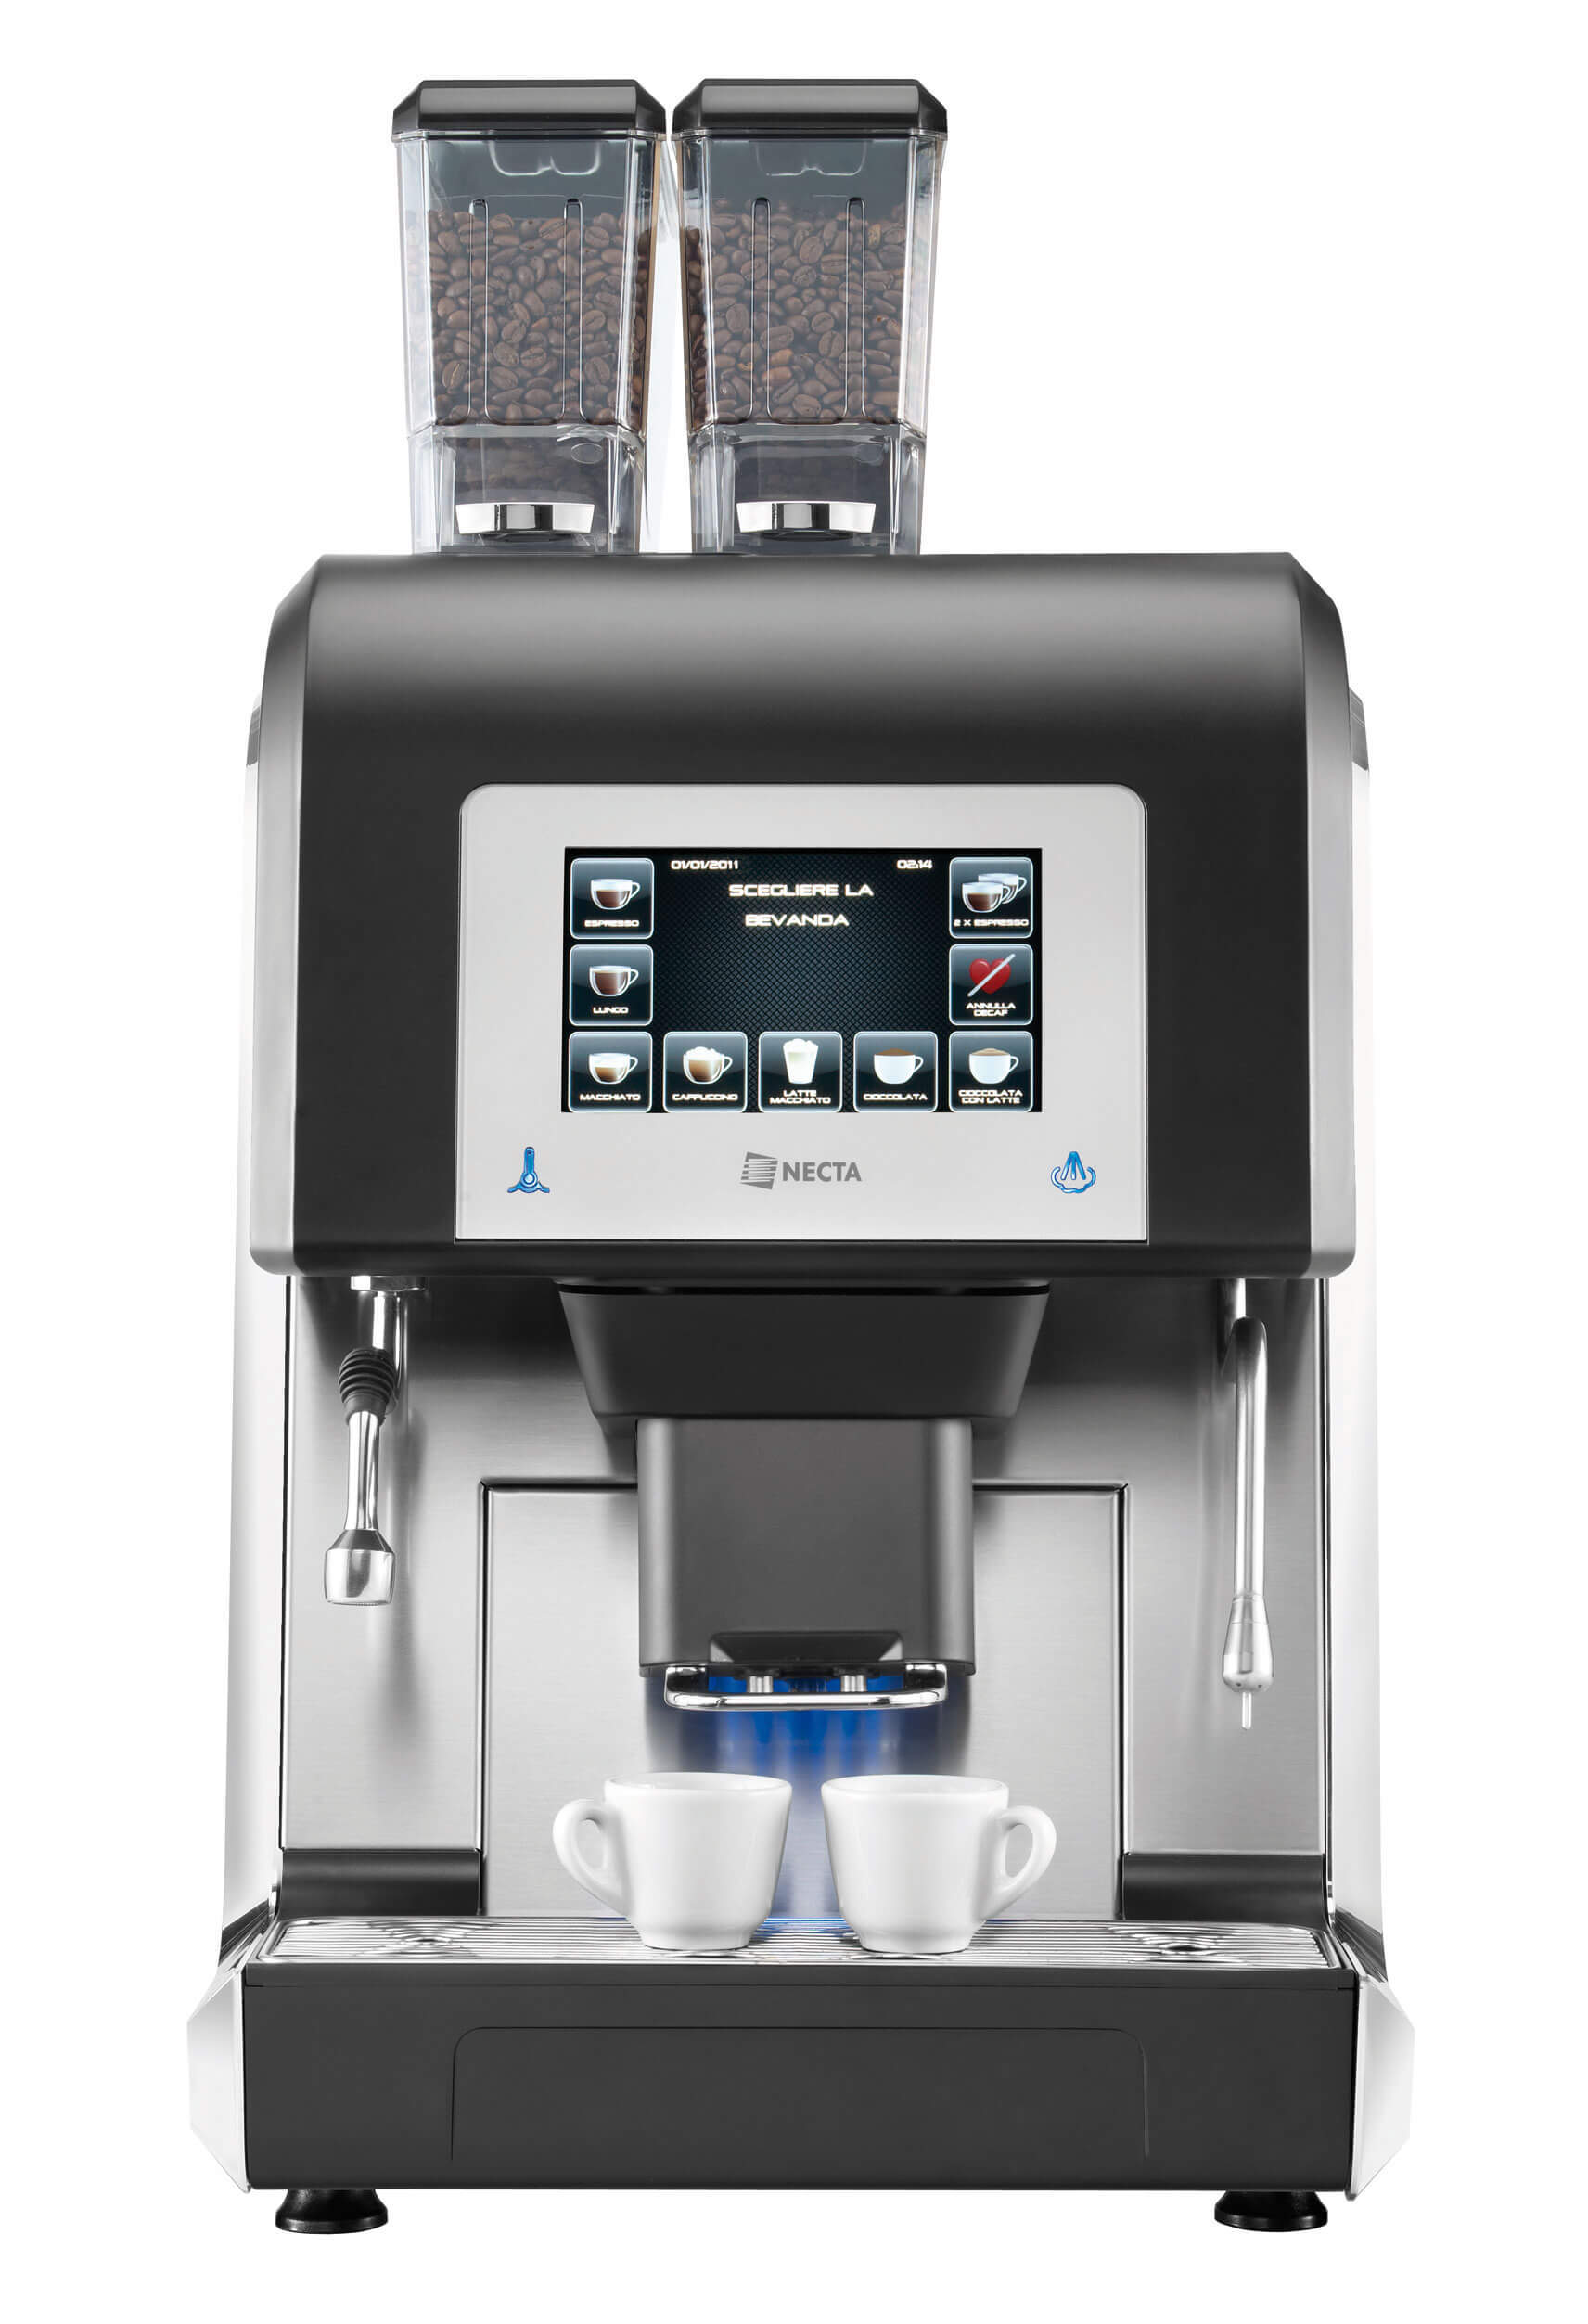 NECTA Karisma Doppel Espresso 962808 | Kamasega